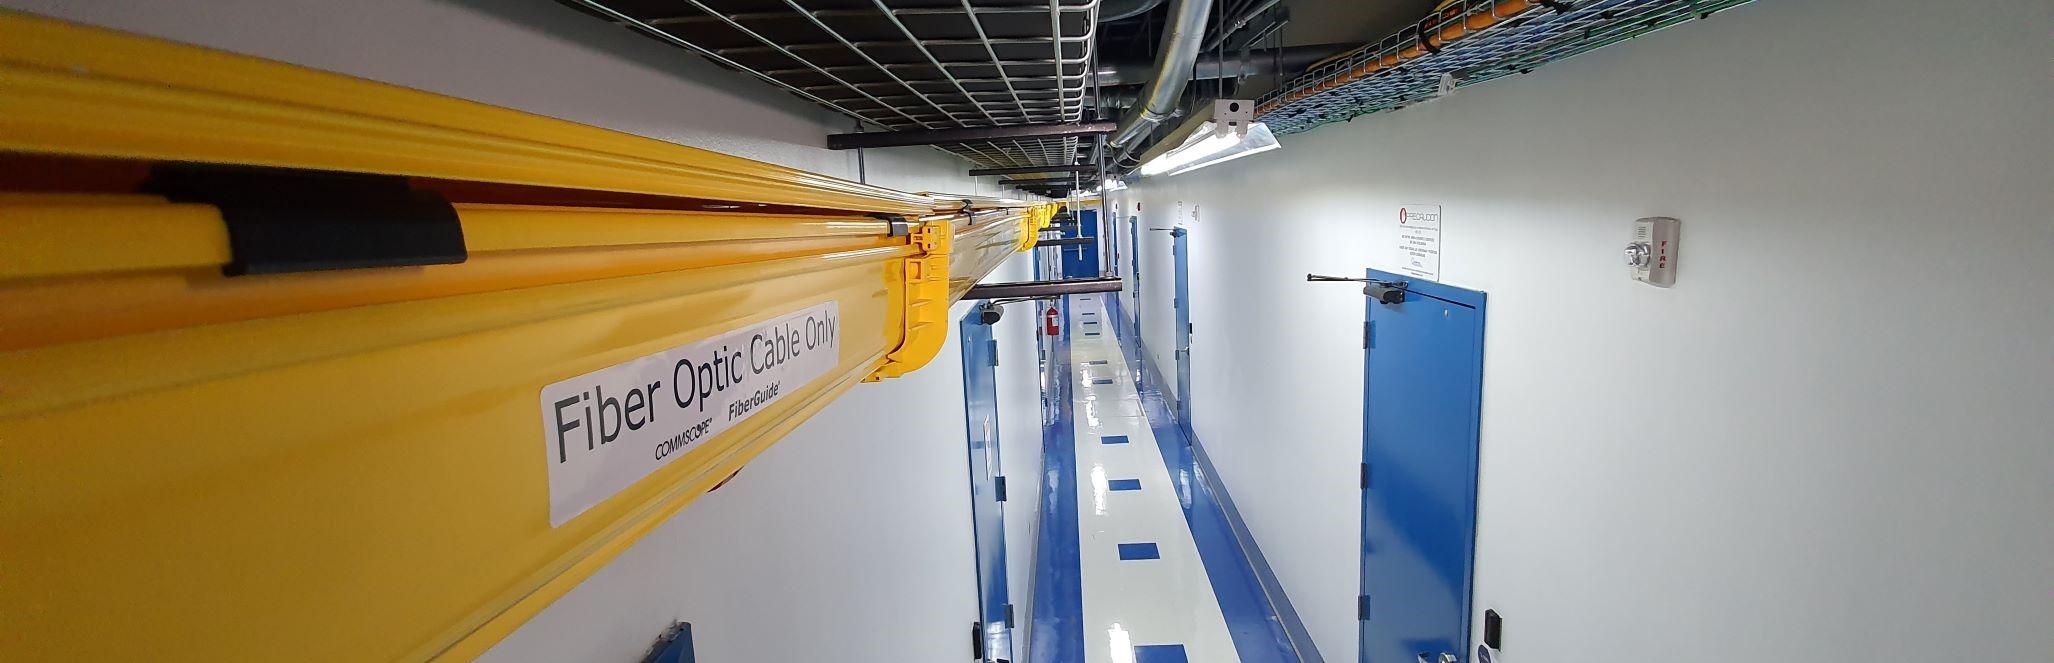 ADN Datacenters Expands Data Storage in Costa Rica